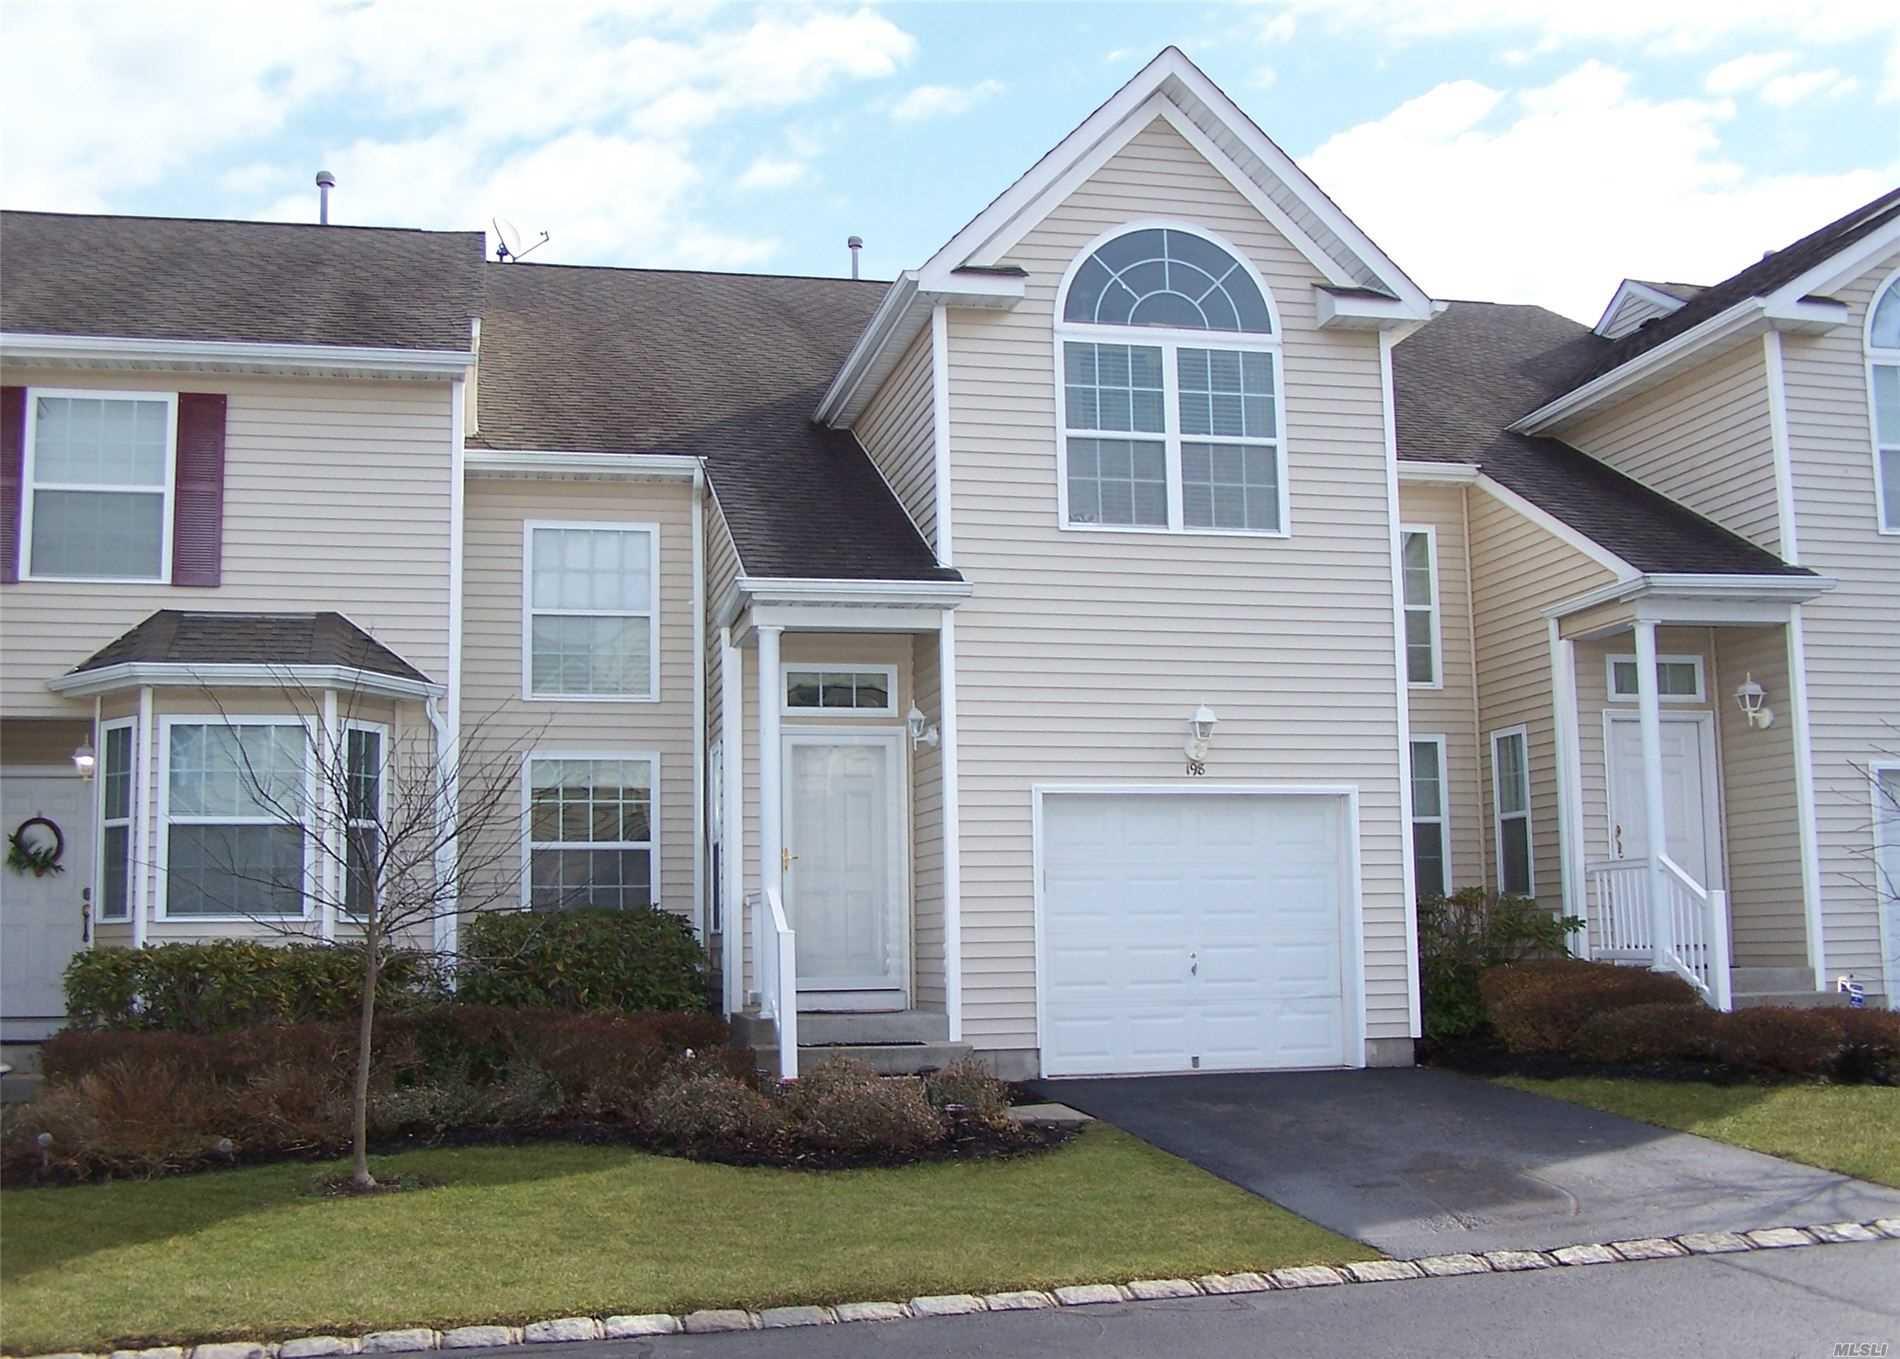 Property for sale at 198 Kettles Lane, Medford NY 11763, Medford,  New York 11763